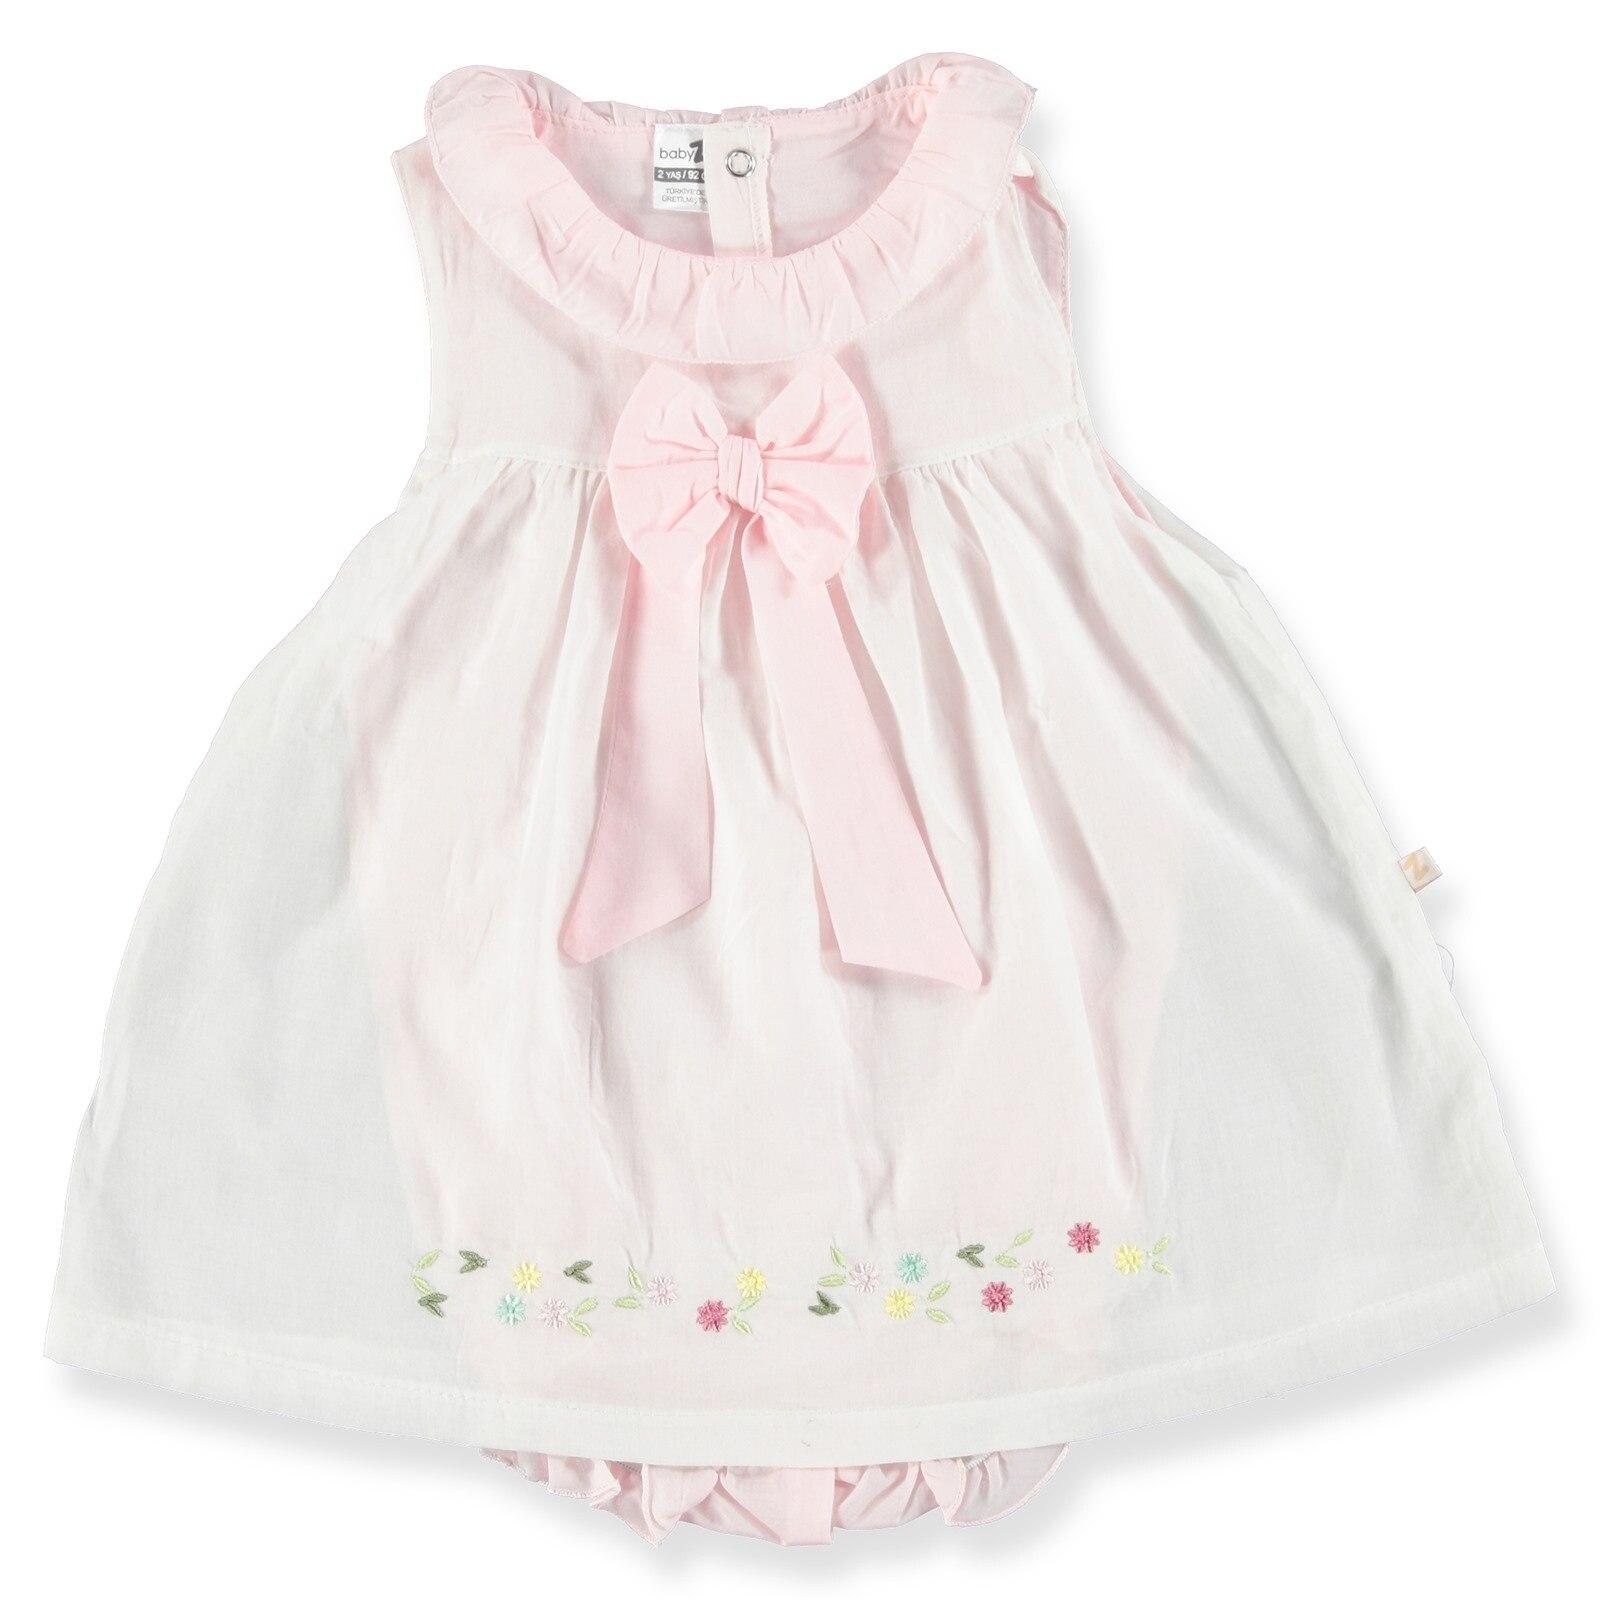 Ebebek BabyZ Baby Girl Embroidered Sleeveless Dress Bodysuit